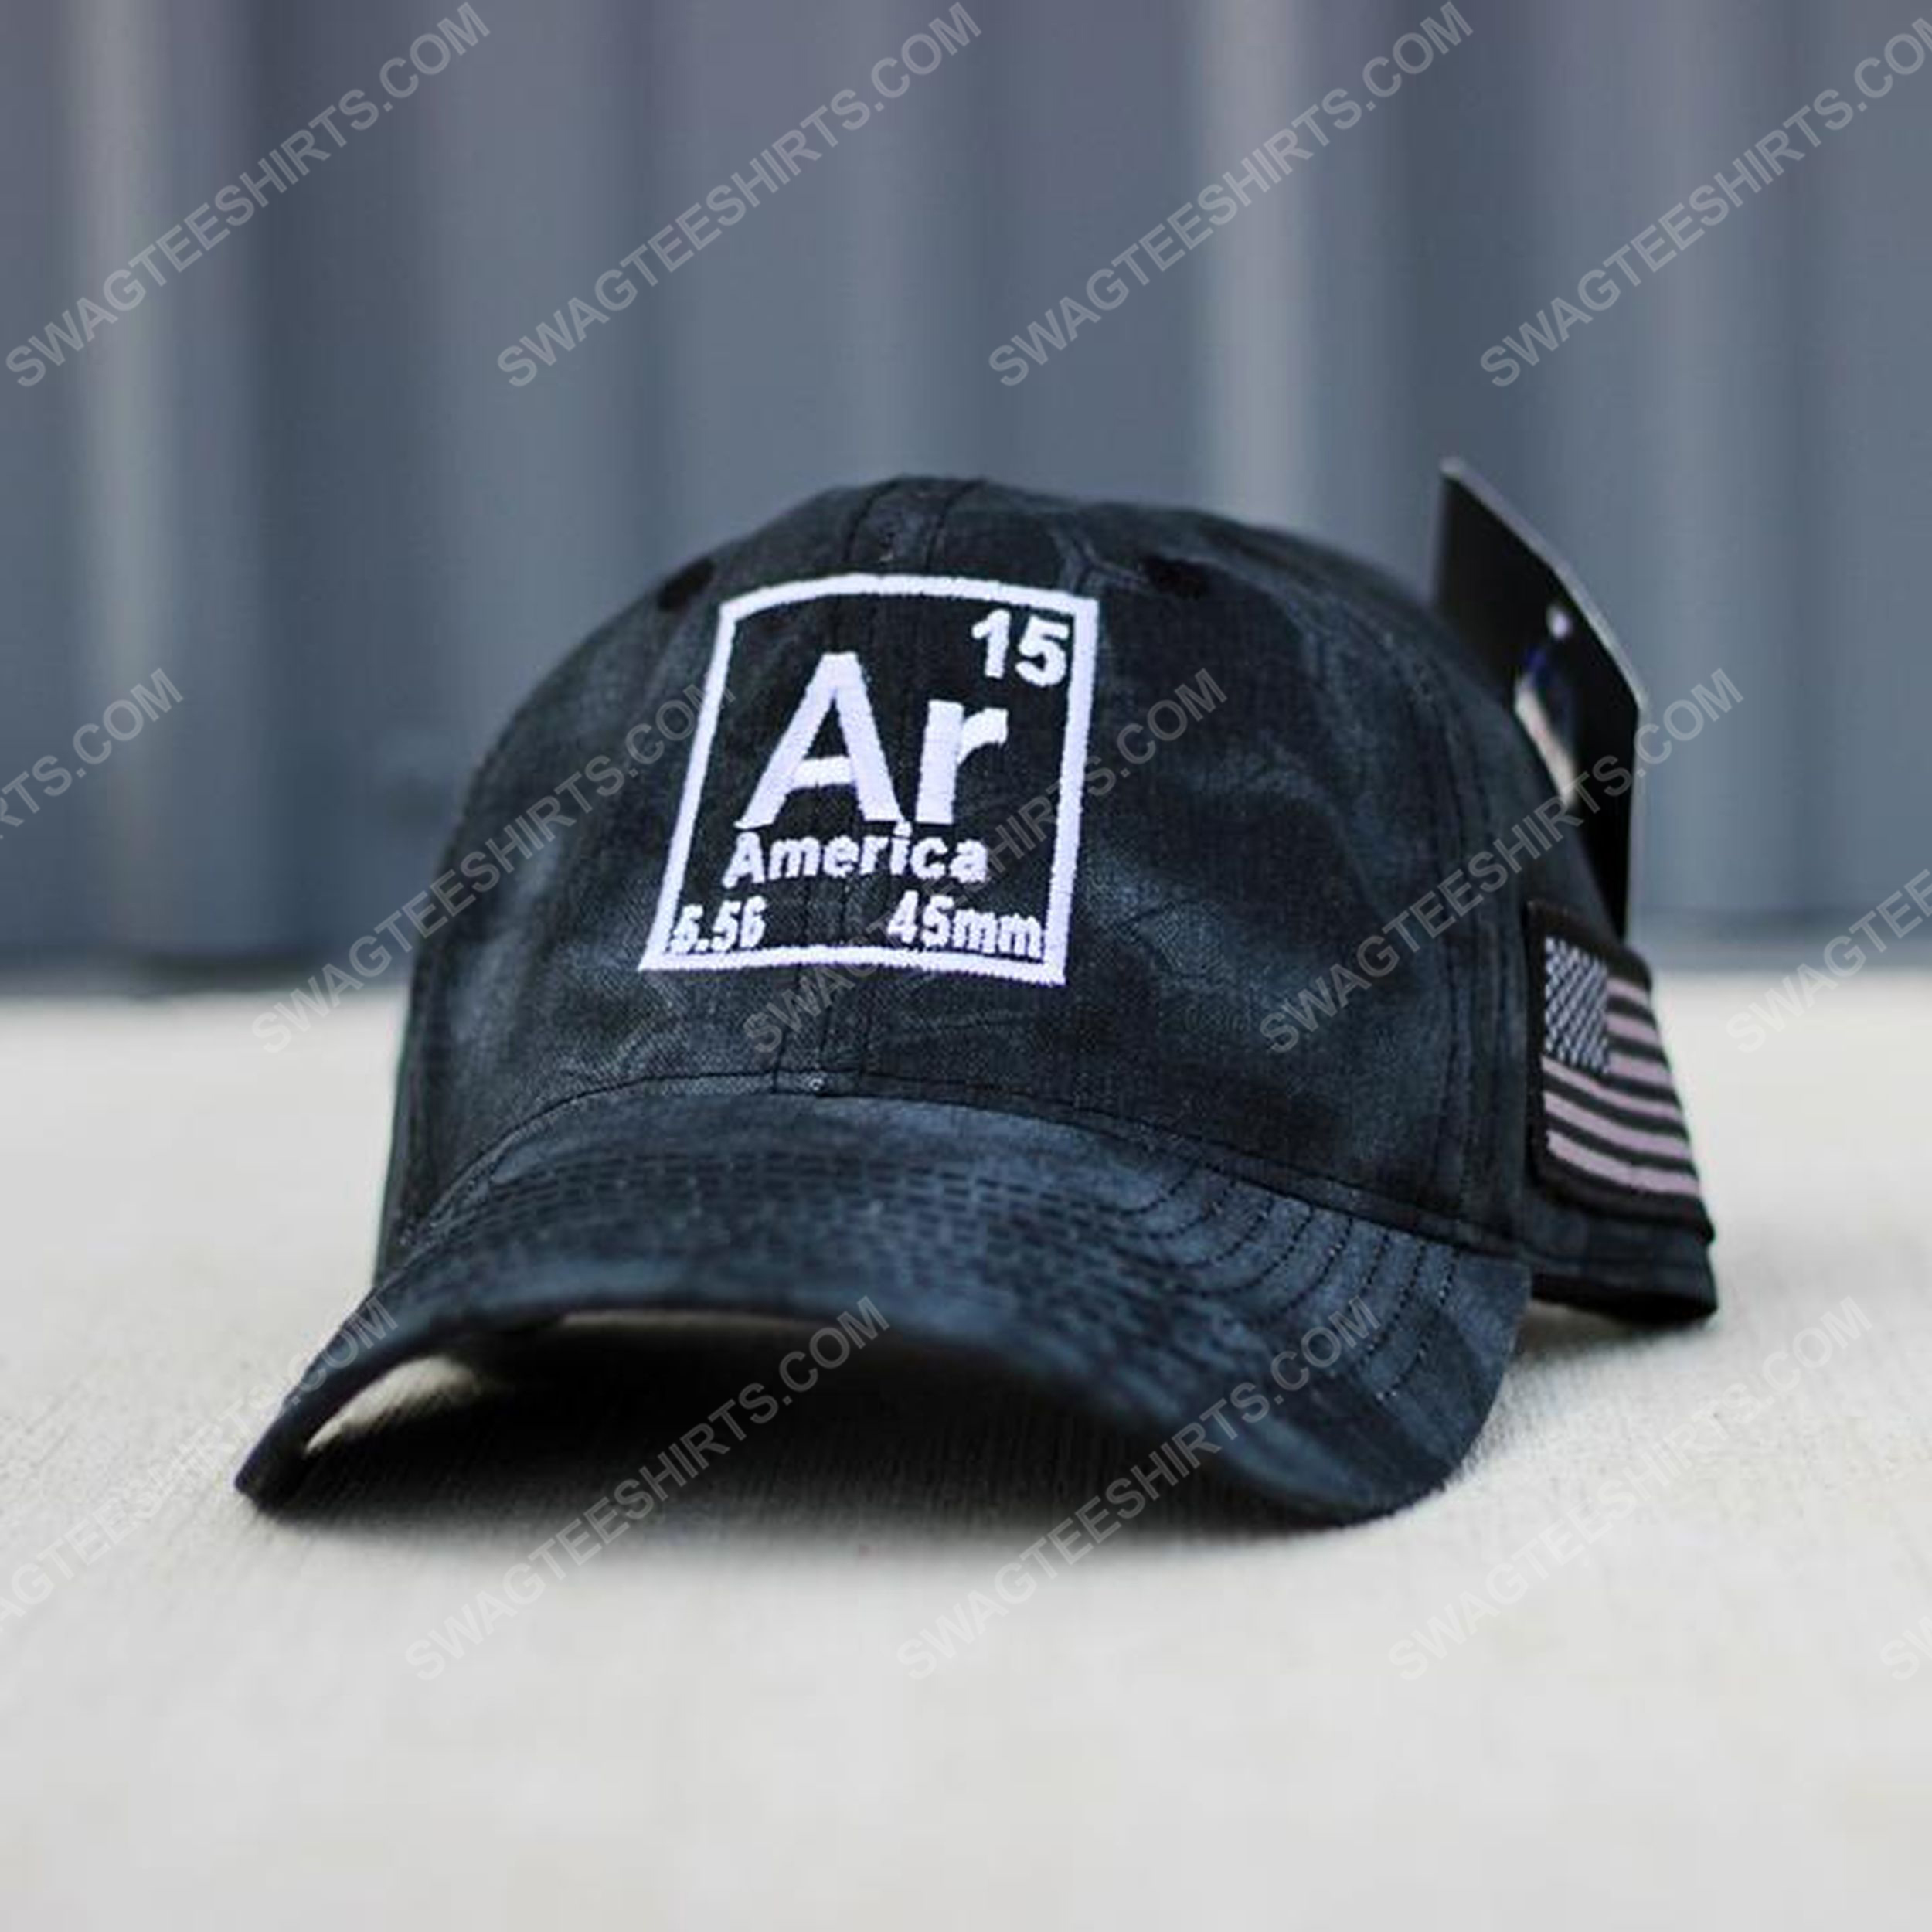 Ar 15 american full print classic hat 1 - Copy